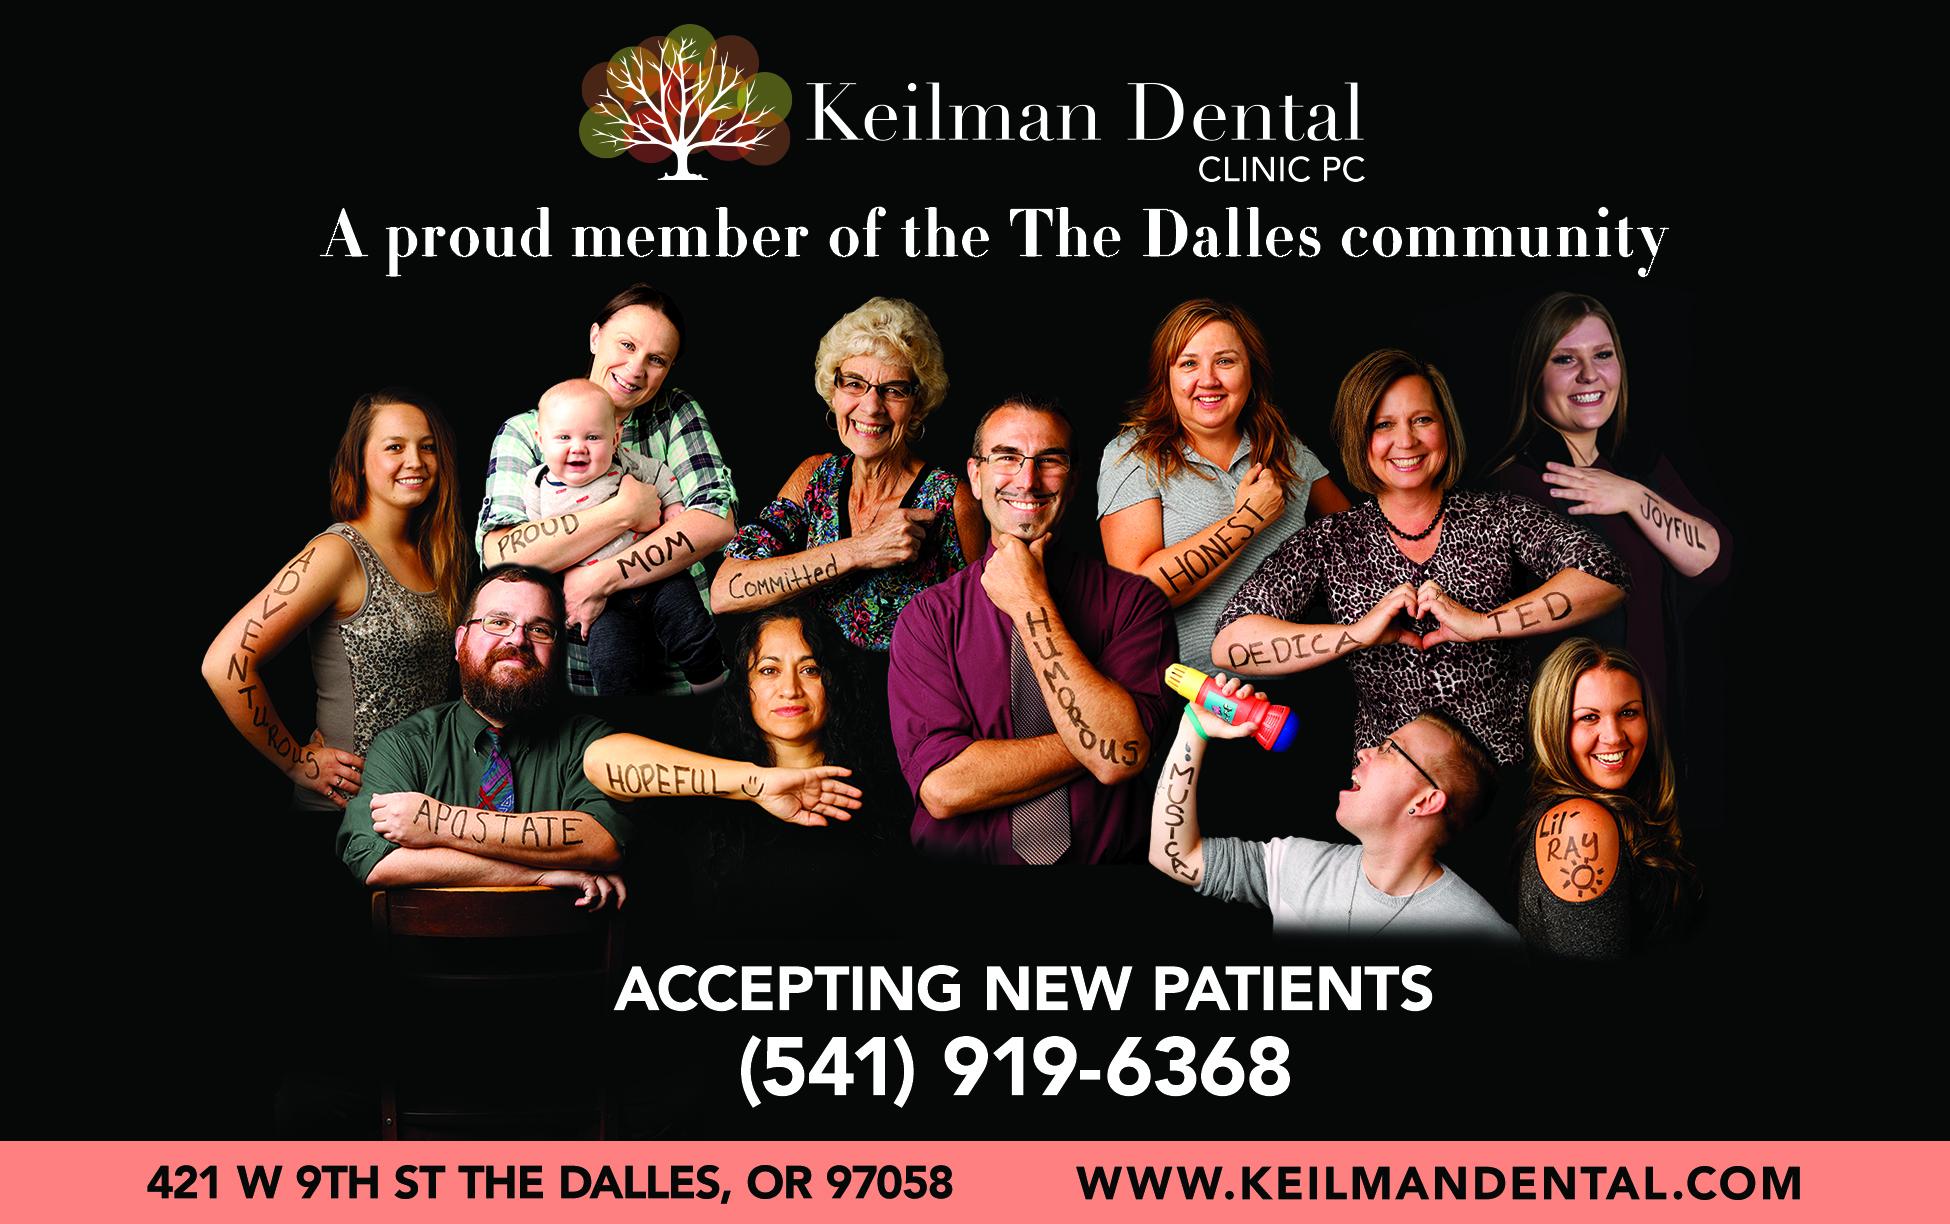 393958_KeilmanCommunityEvent-Banner_032519 (1).jpg